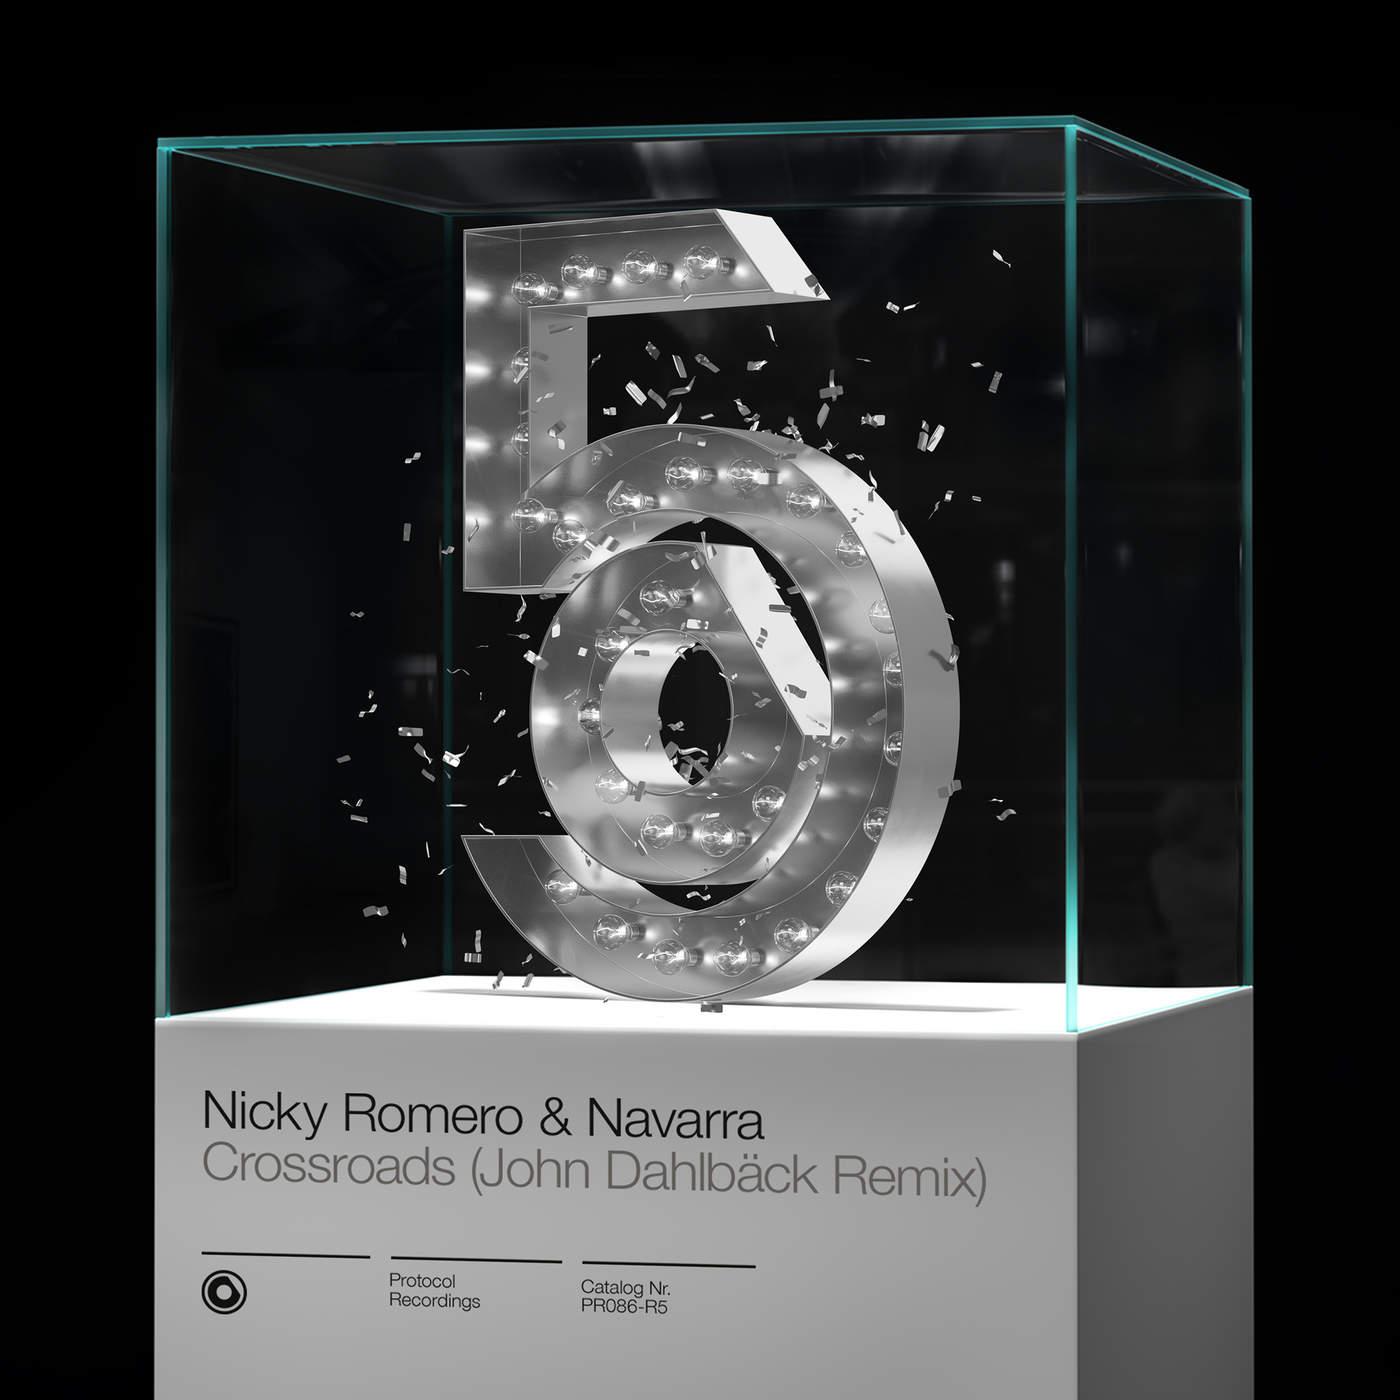 Crossroads (John Dahlbäck Extended Remix) (Single) - Nicky Romero -  Navarra